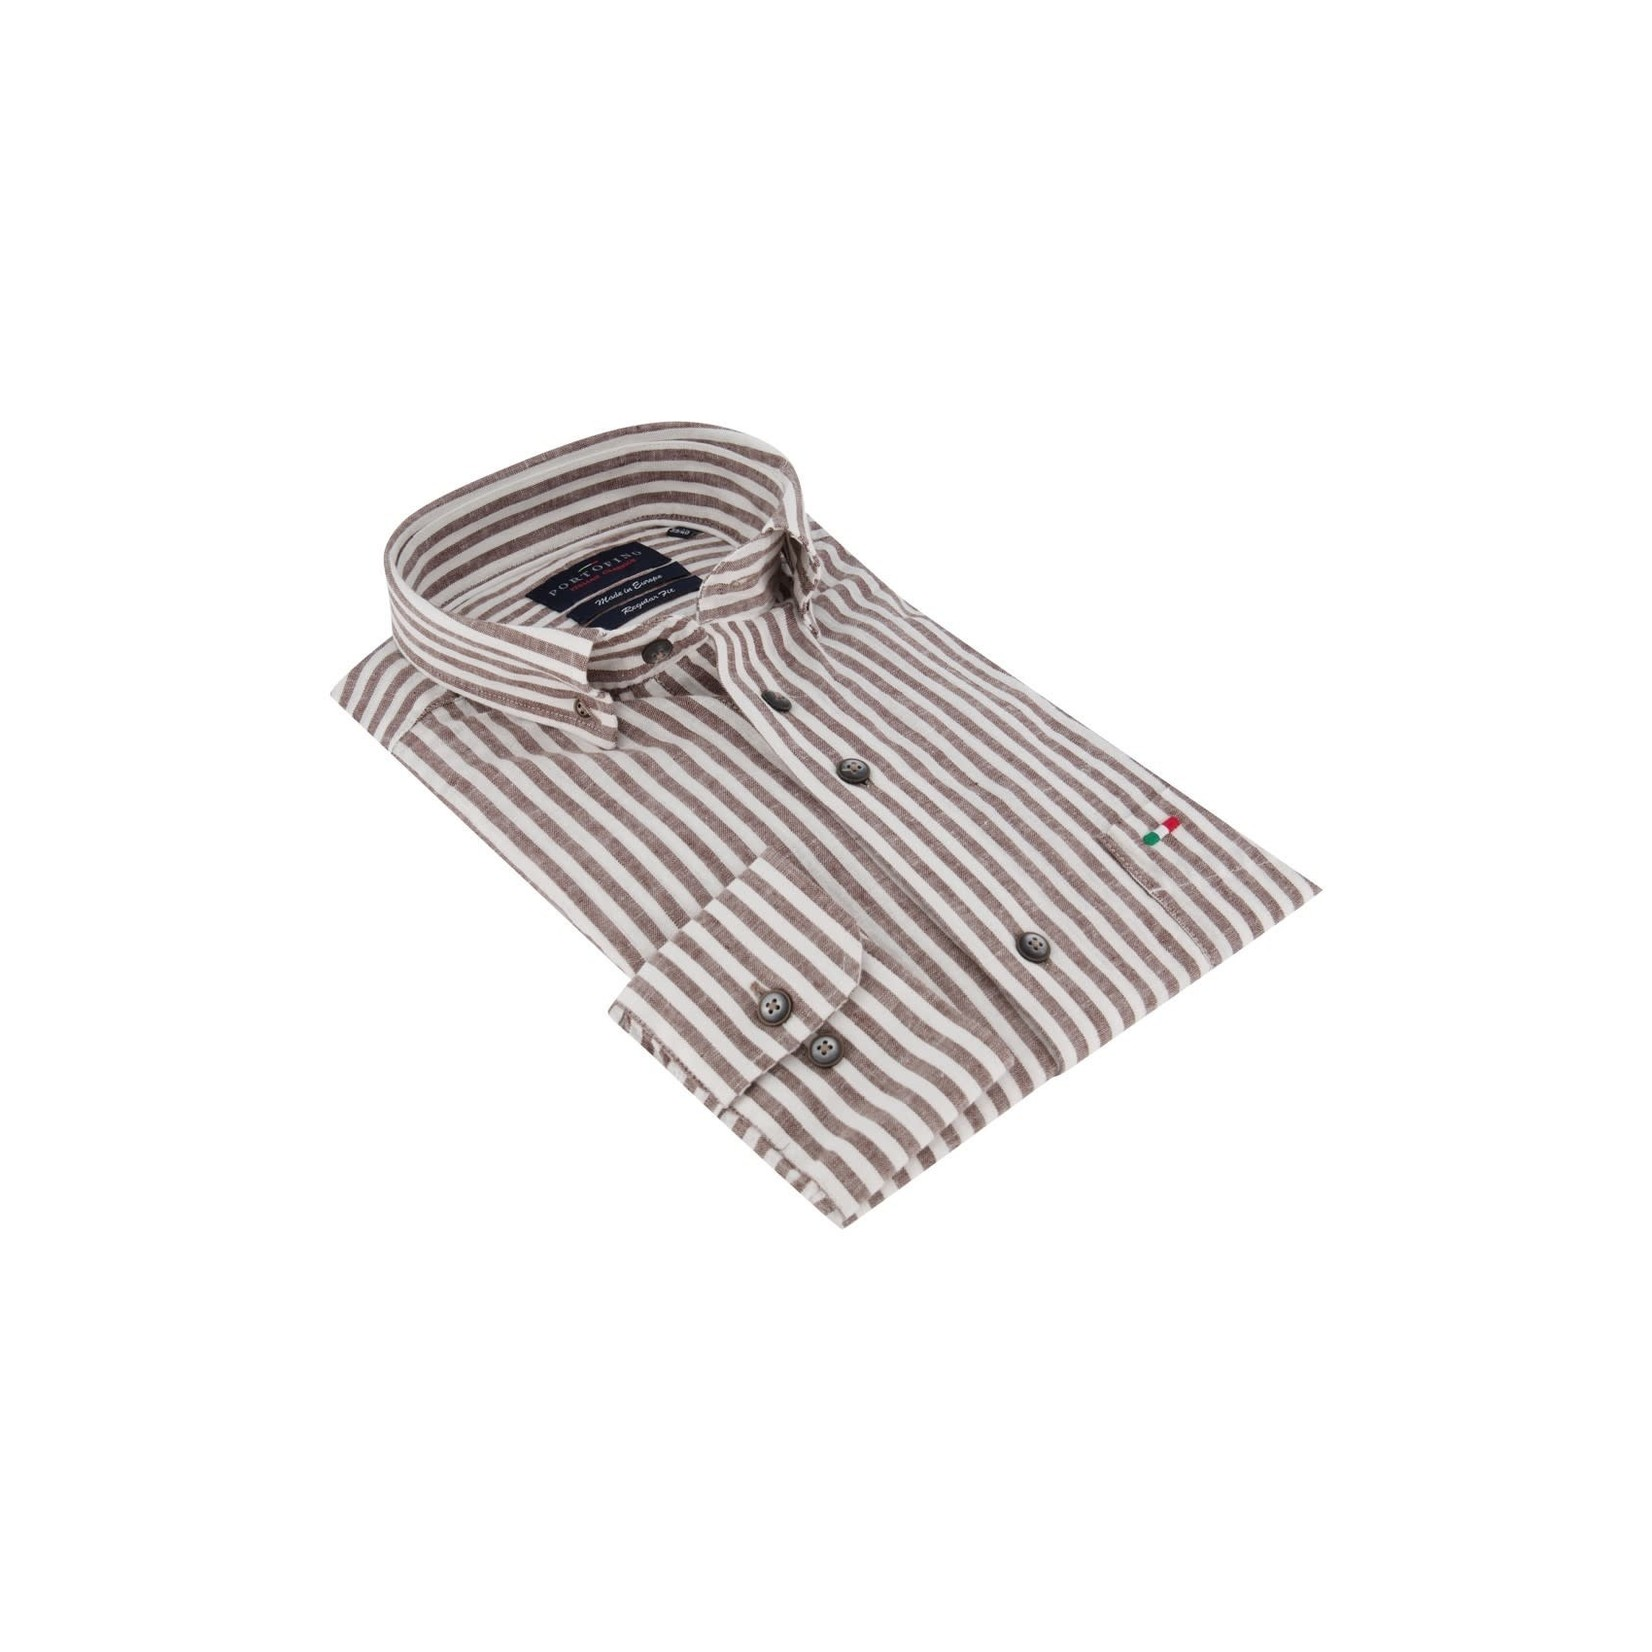 Portofino overhemd regular fit bruin streep